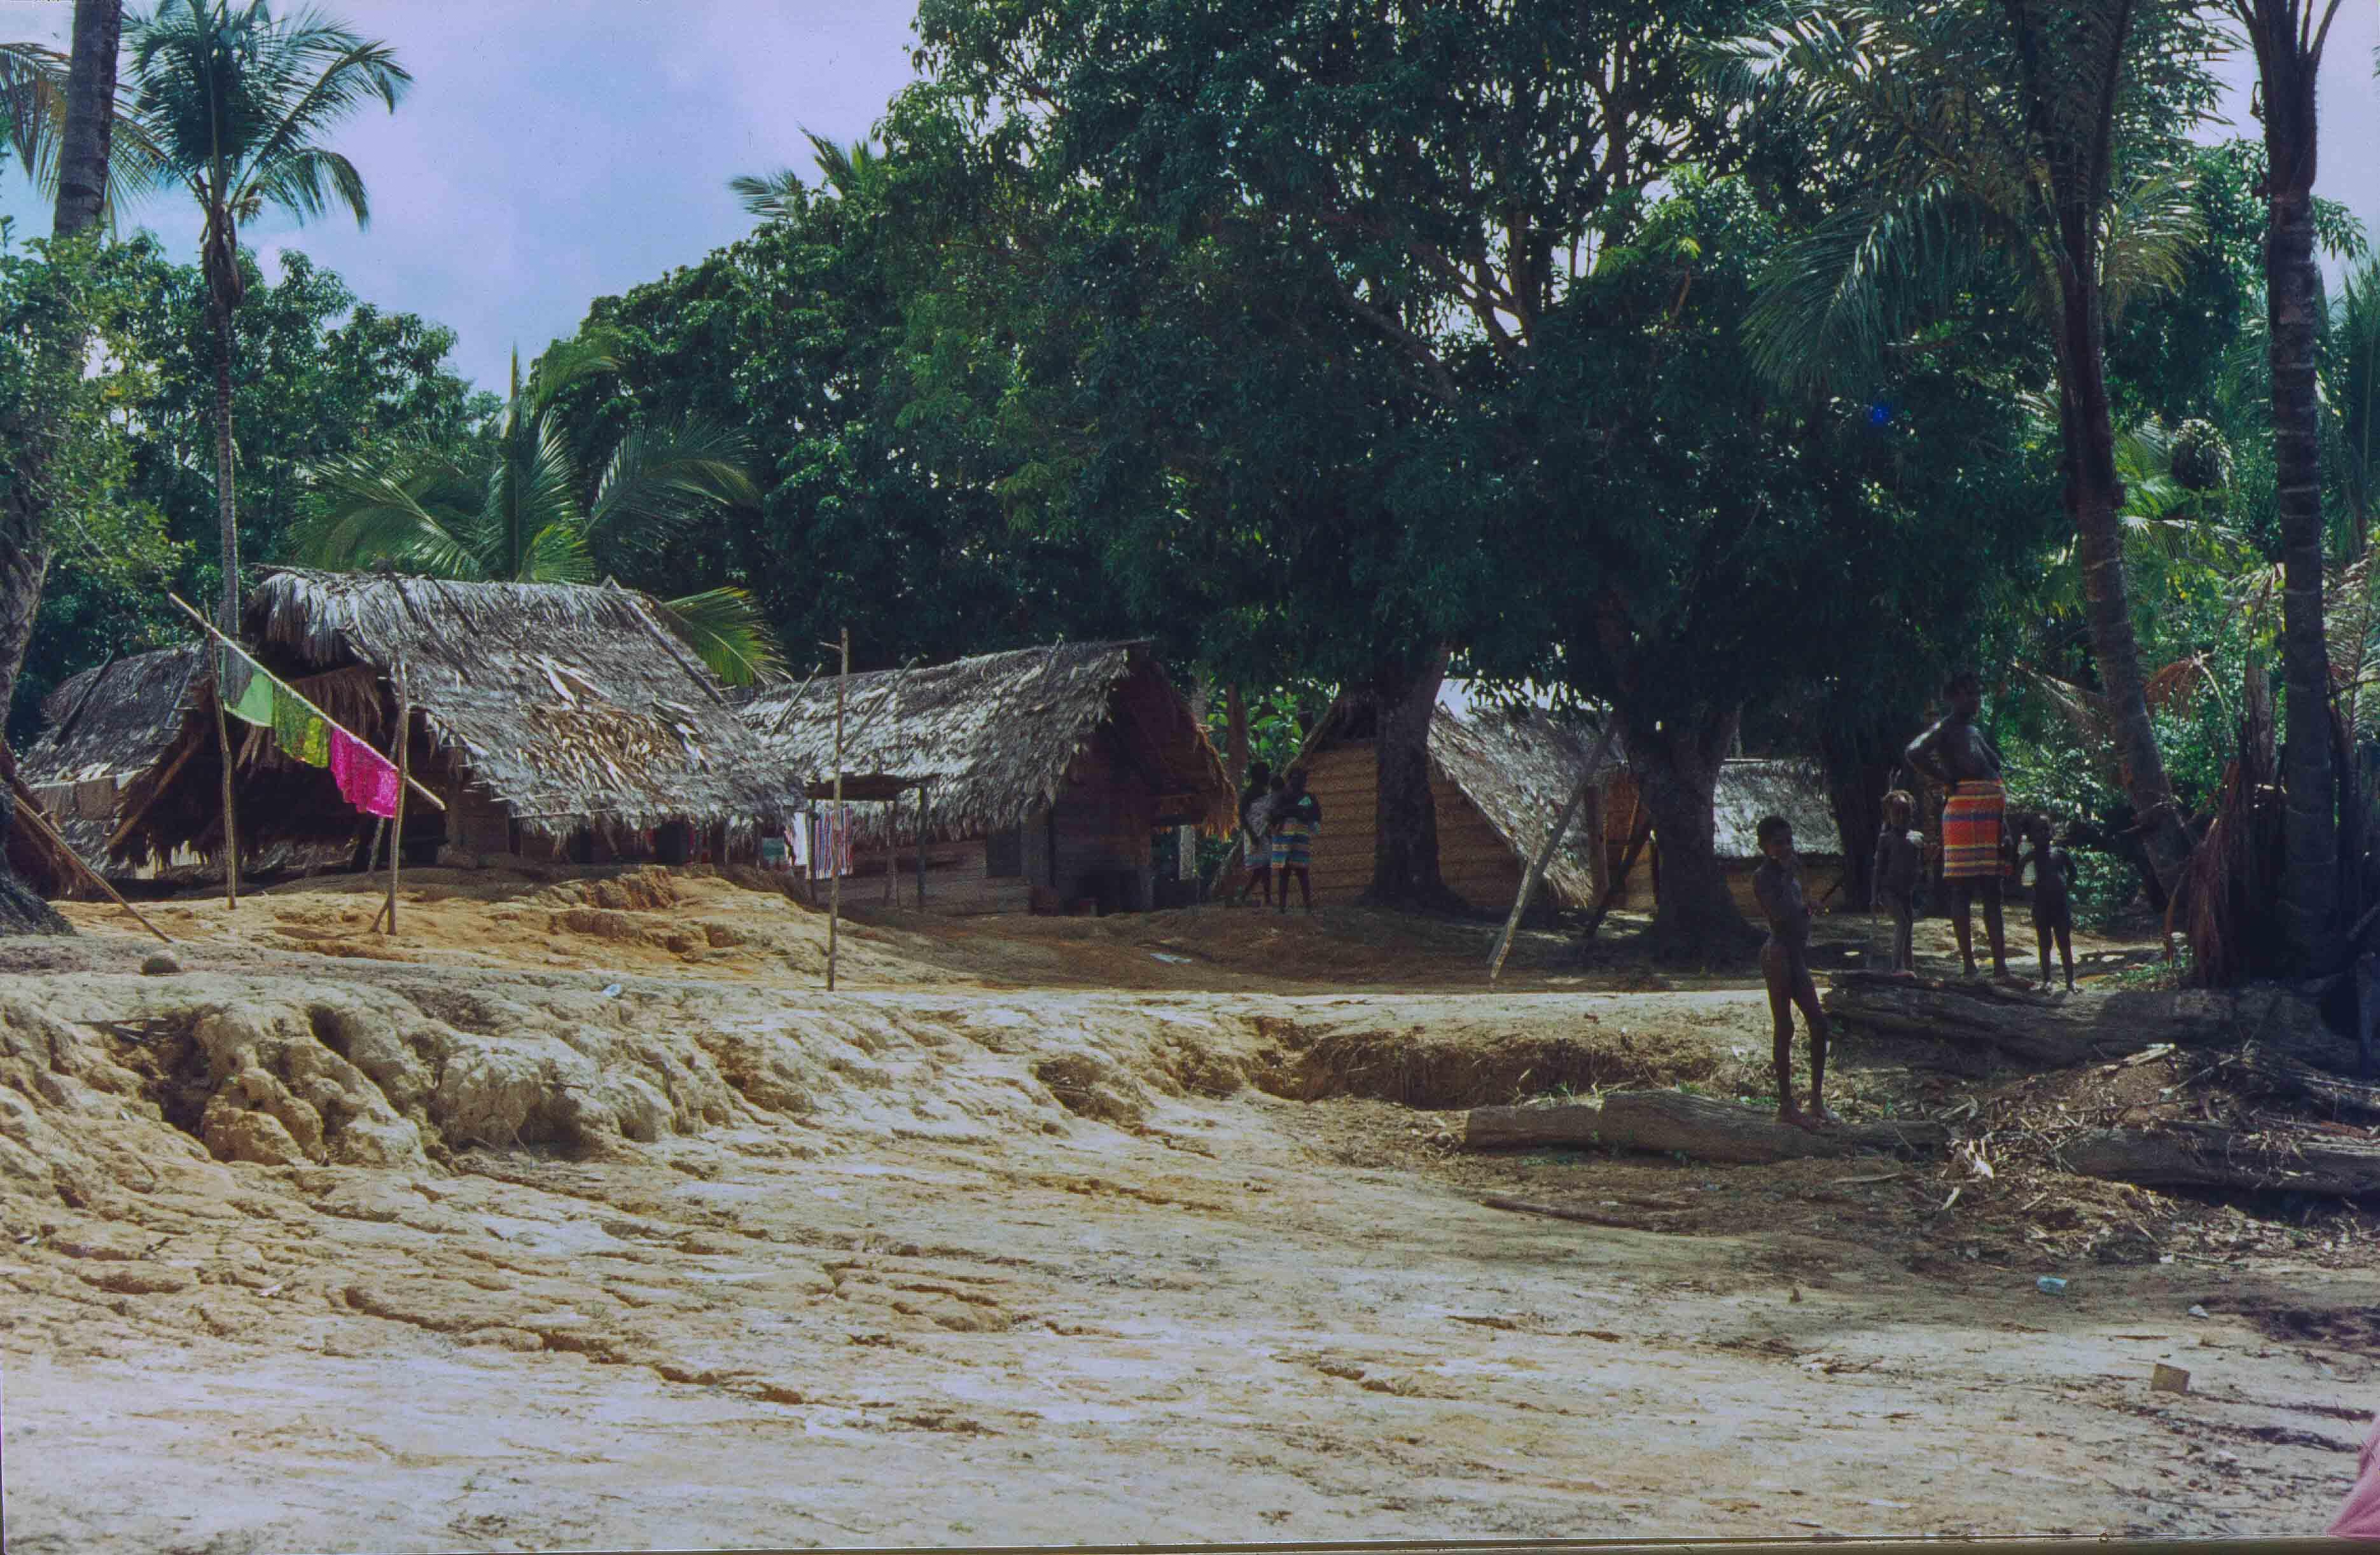 475. Suriname